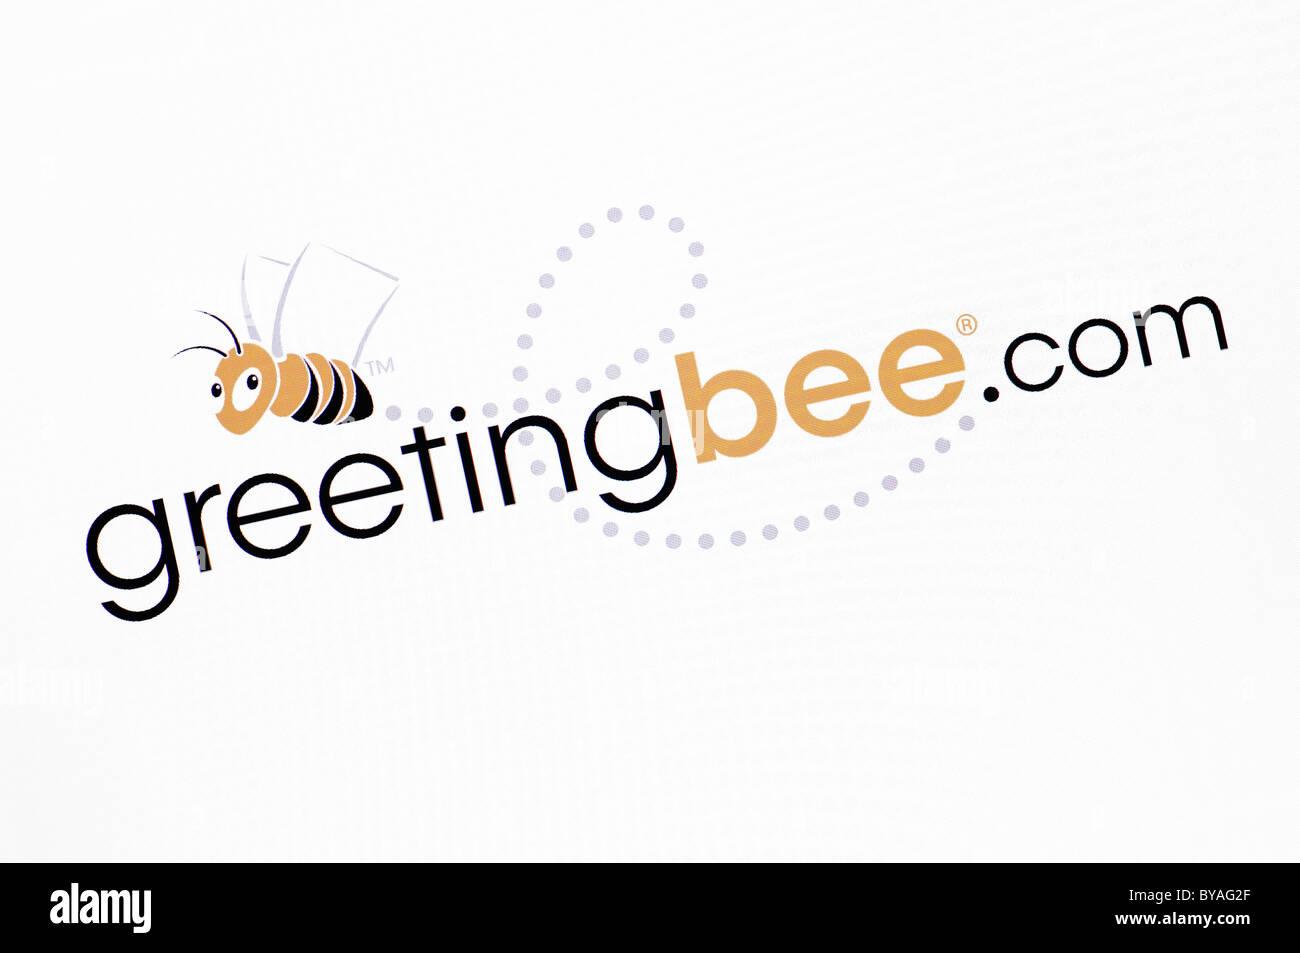 Greetingbee.com Website Screenshot - Stock Image